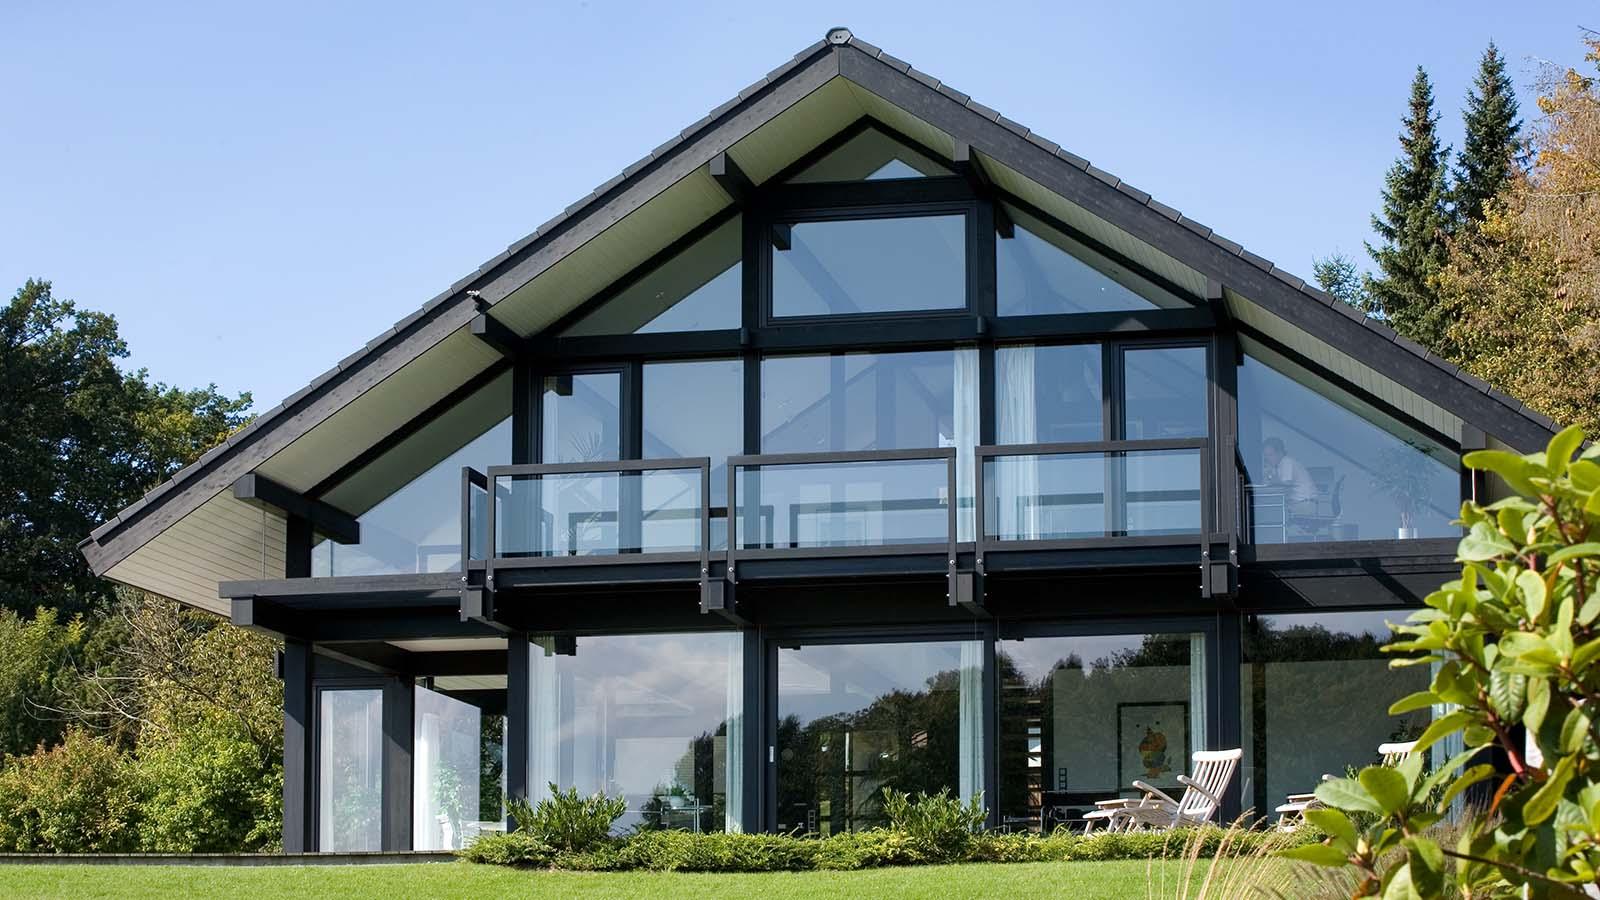 Detmolder Fachwerkhaus – Musterhaus